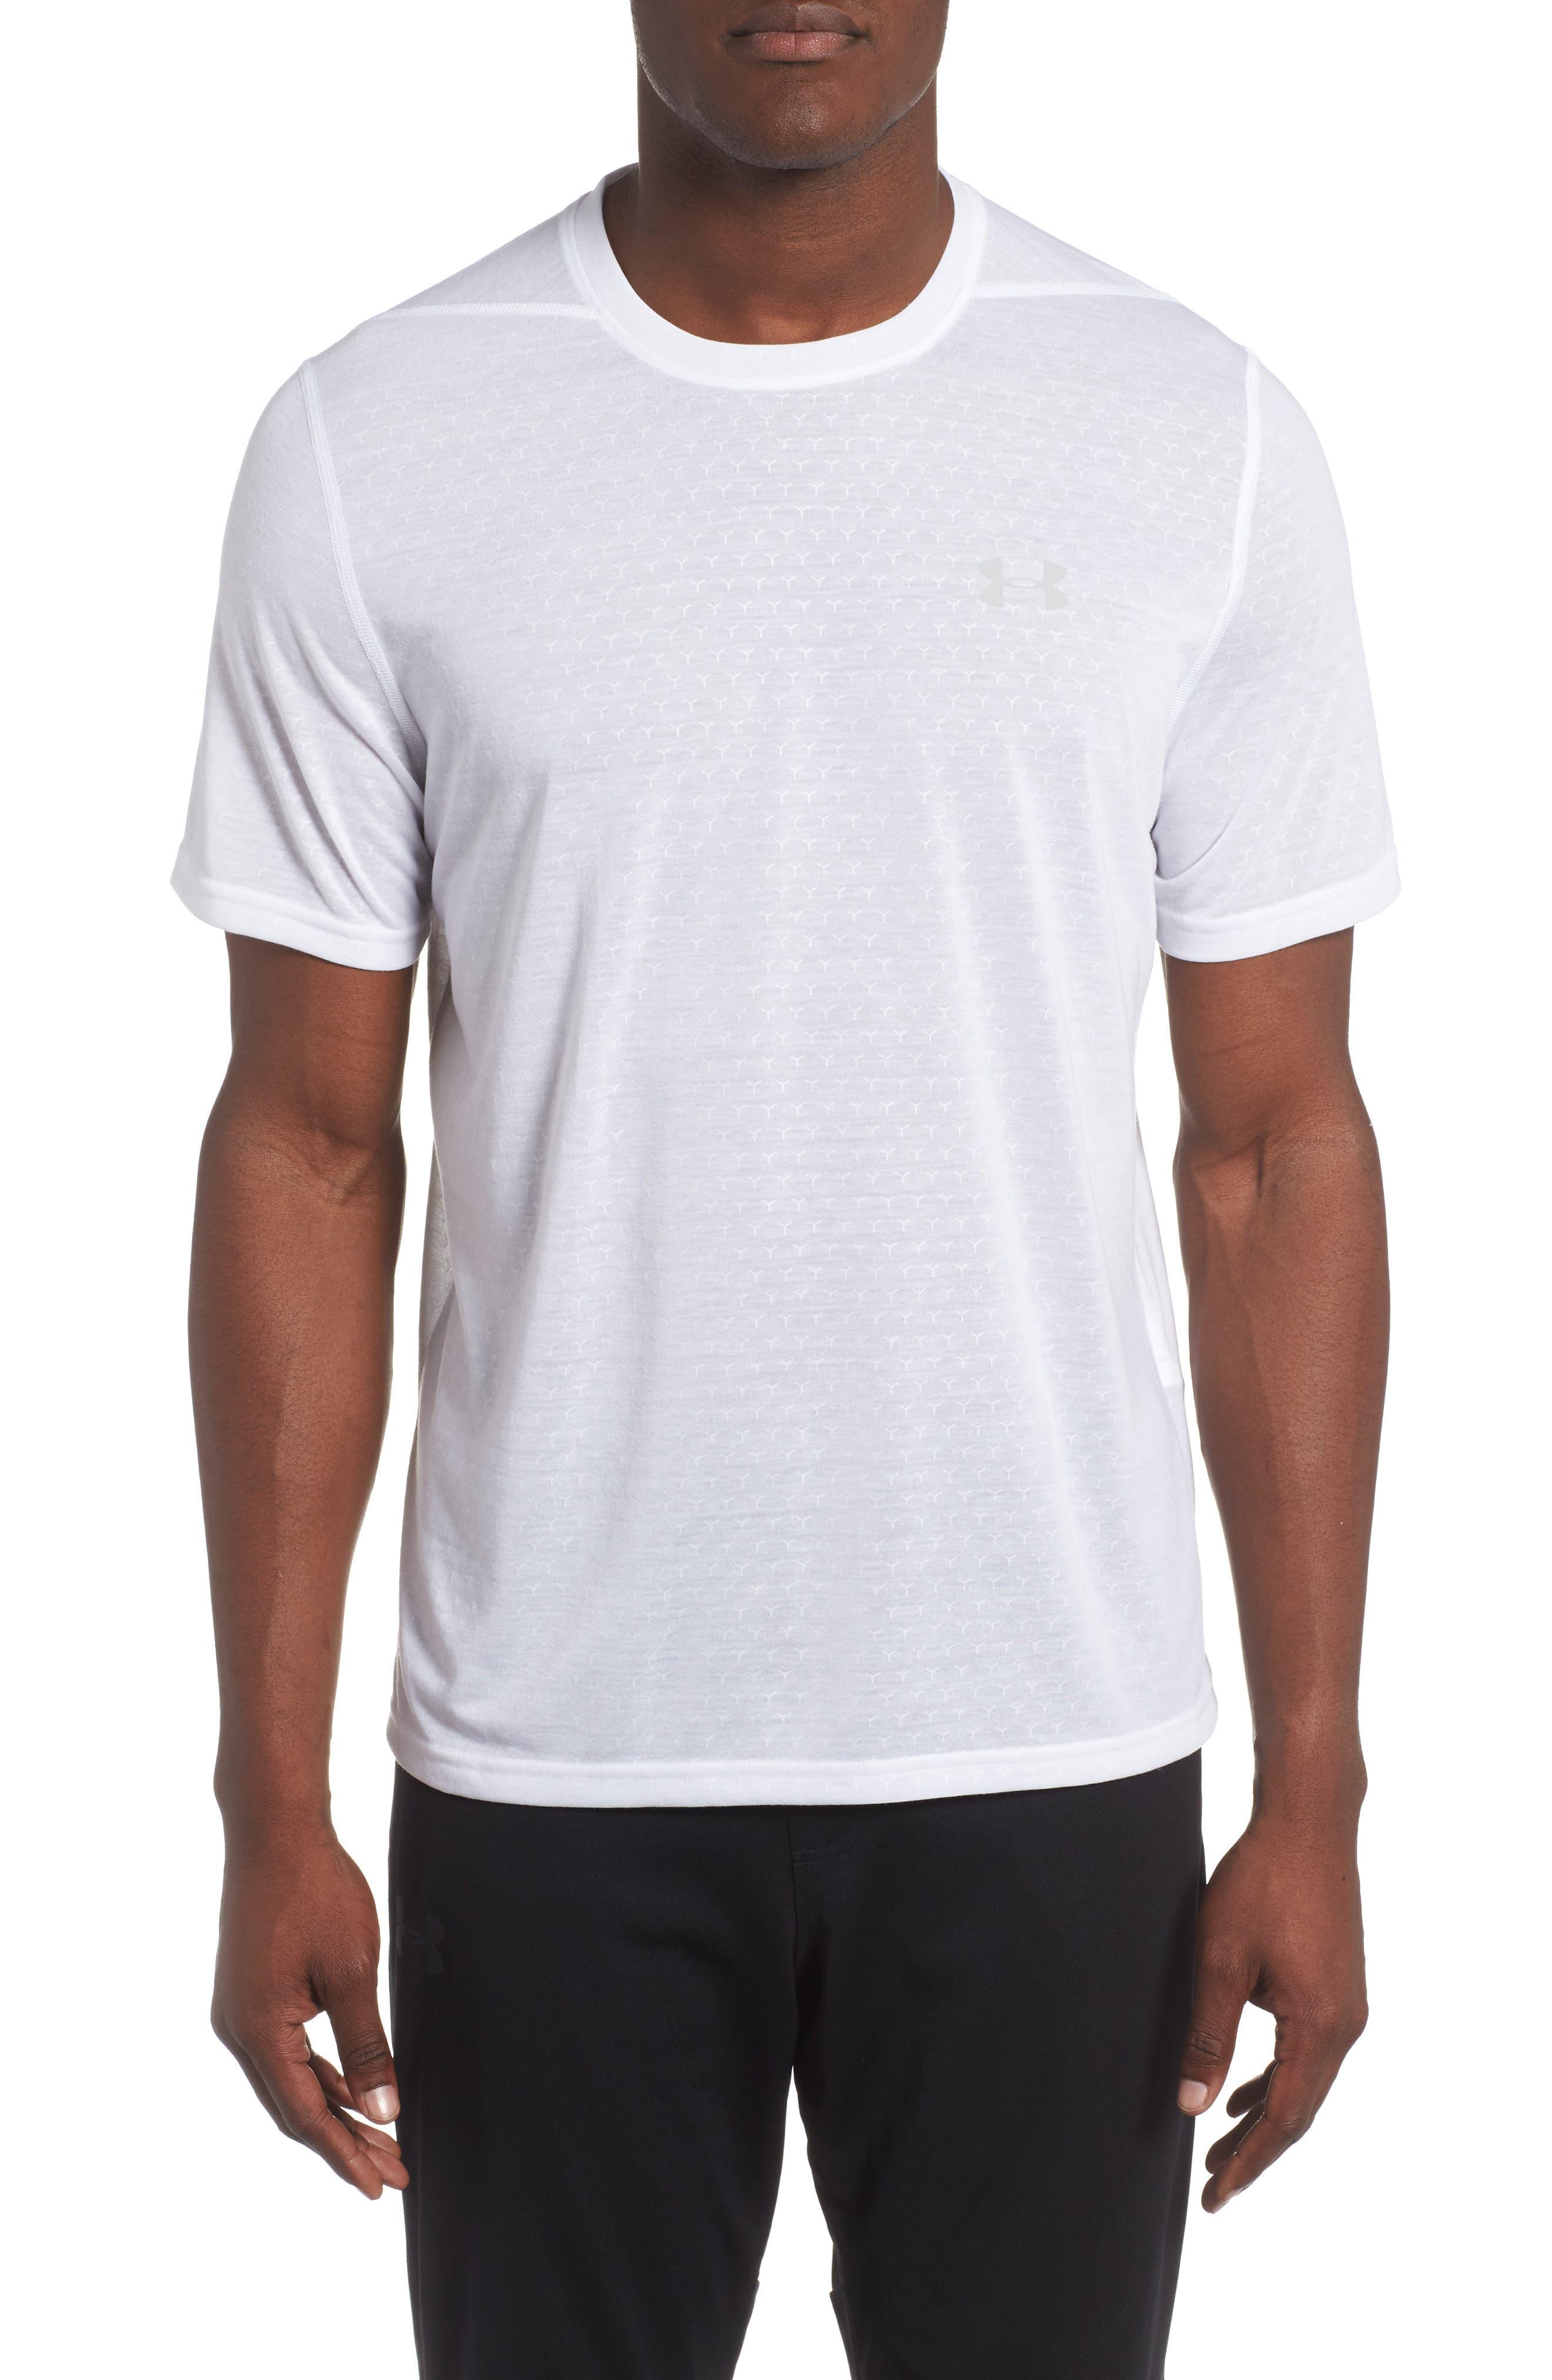 Under Armour Threadborne Siro Regular Fit T-Shirt